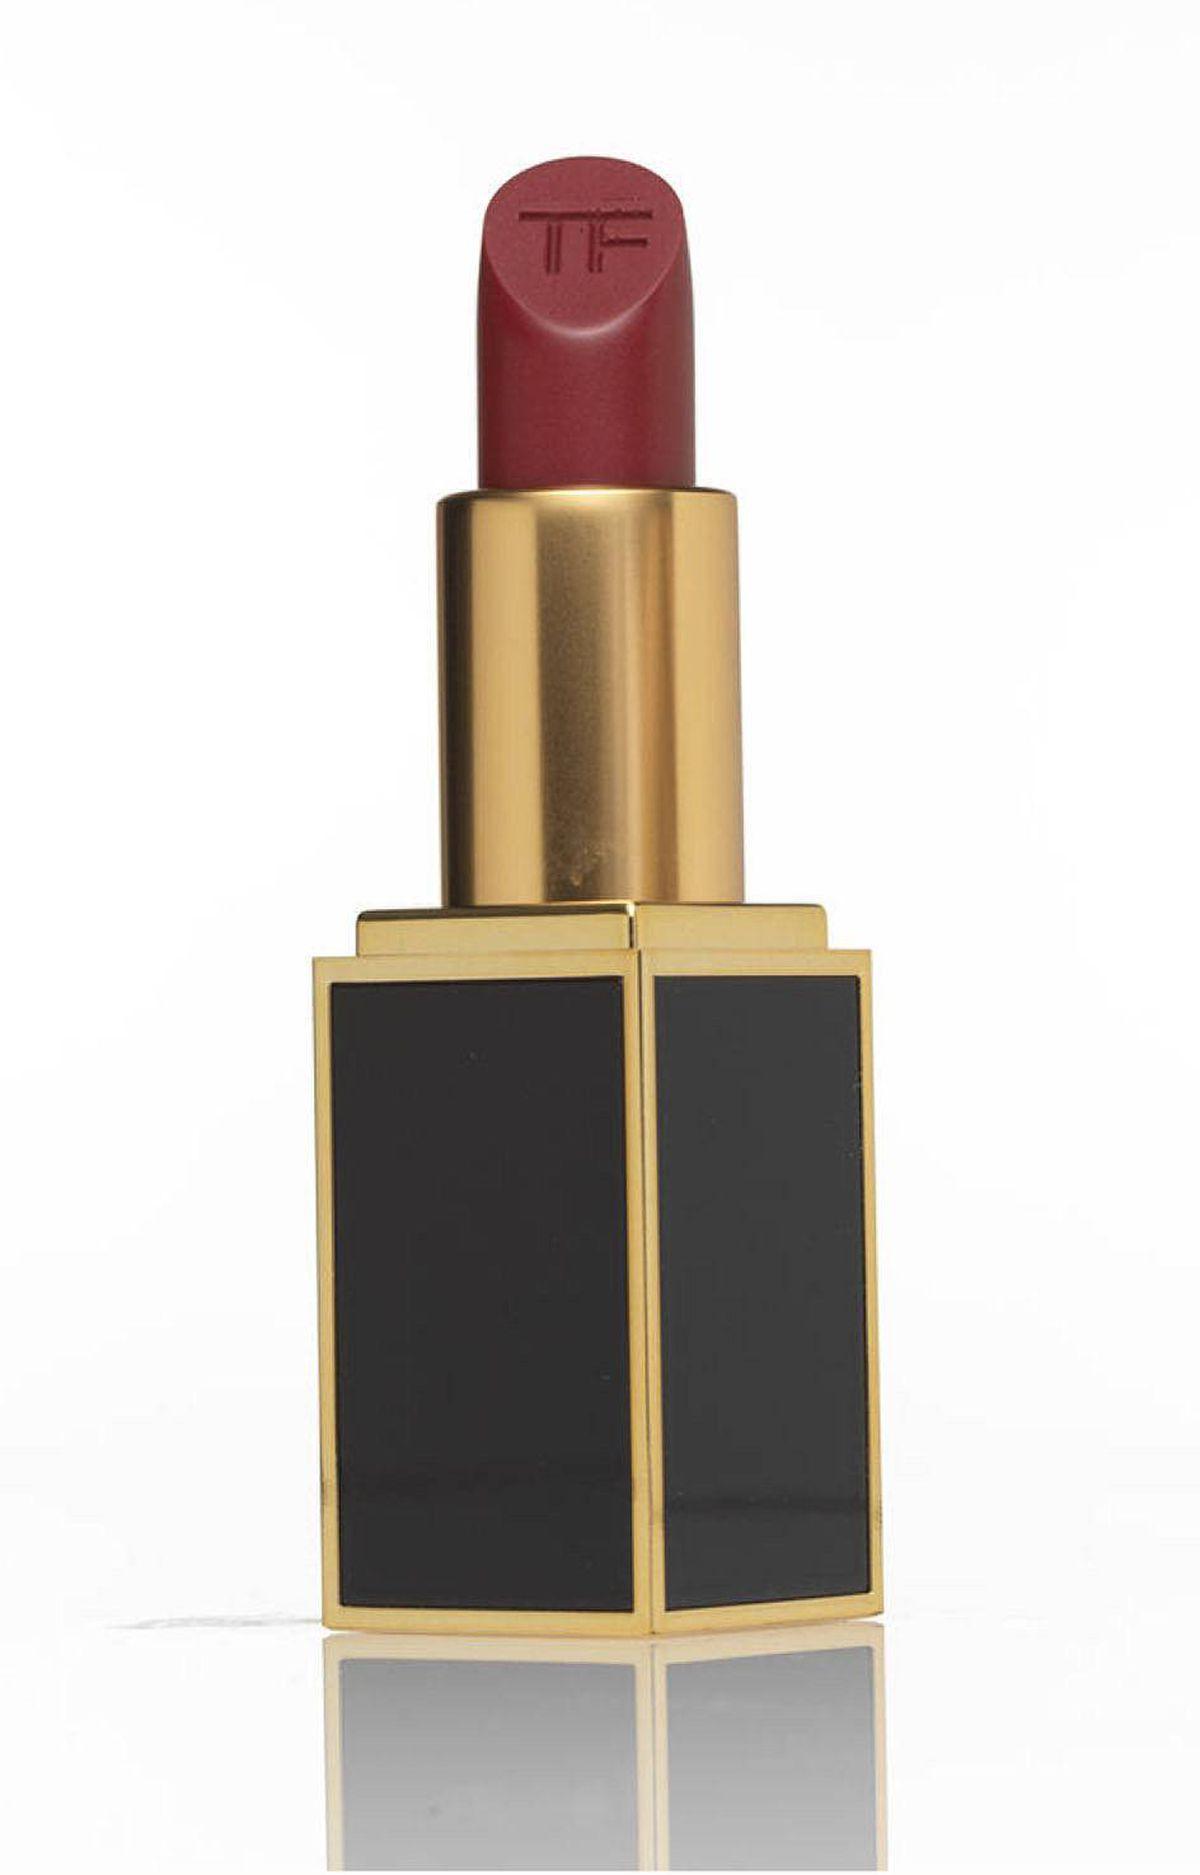 Private Blend Lipstick in Crimson Noir by Tom Ford, $55 at Holt Renfrew (www.holtrenfew.com)